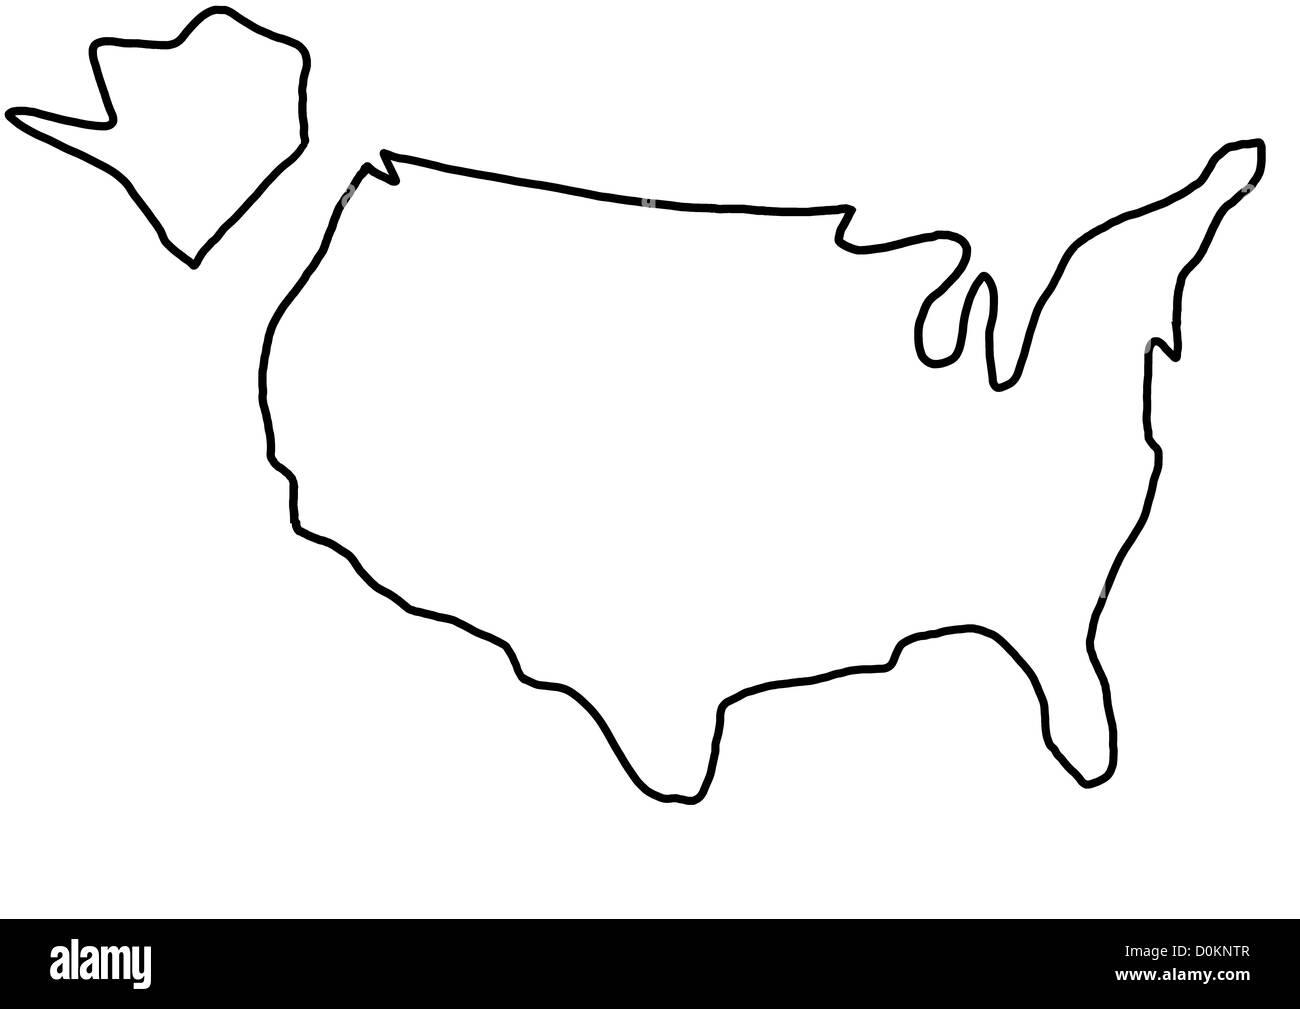 Usa Us United States Amerika Vereinigte Staaten Karte Landkarte